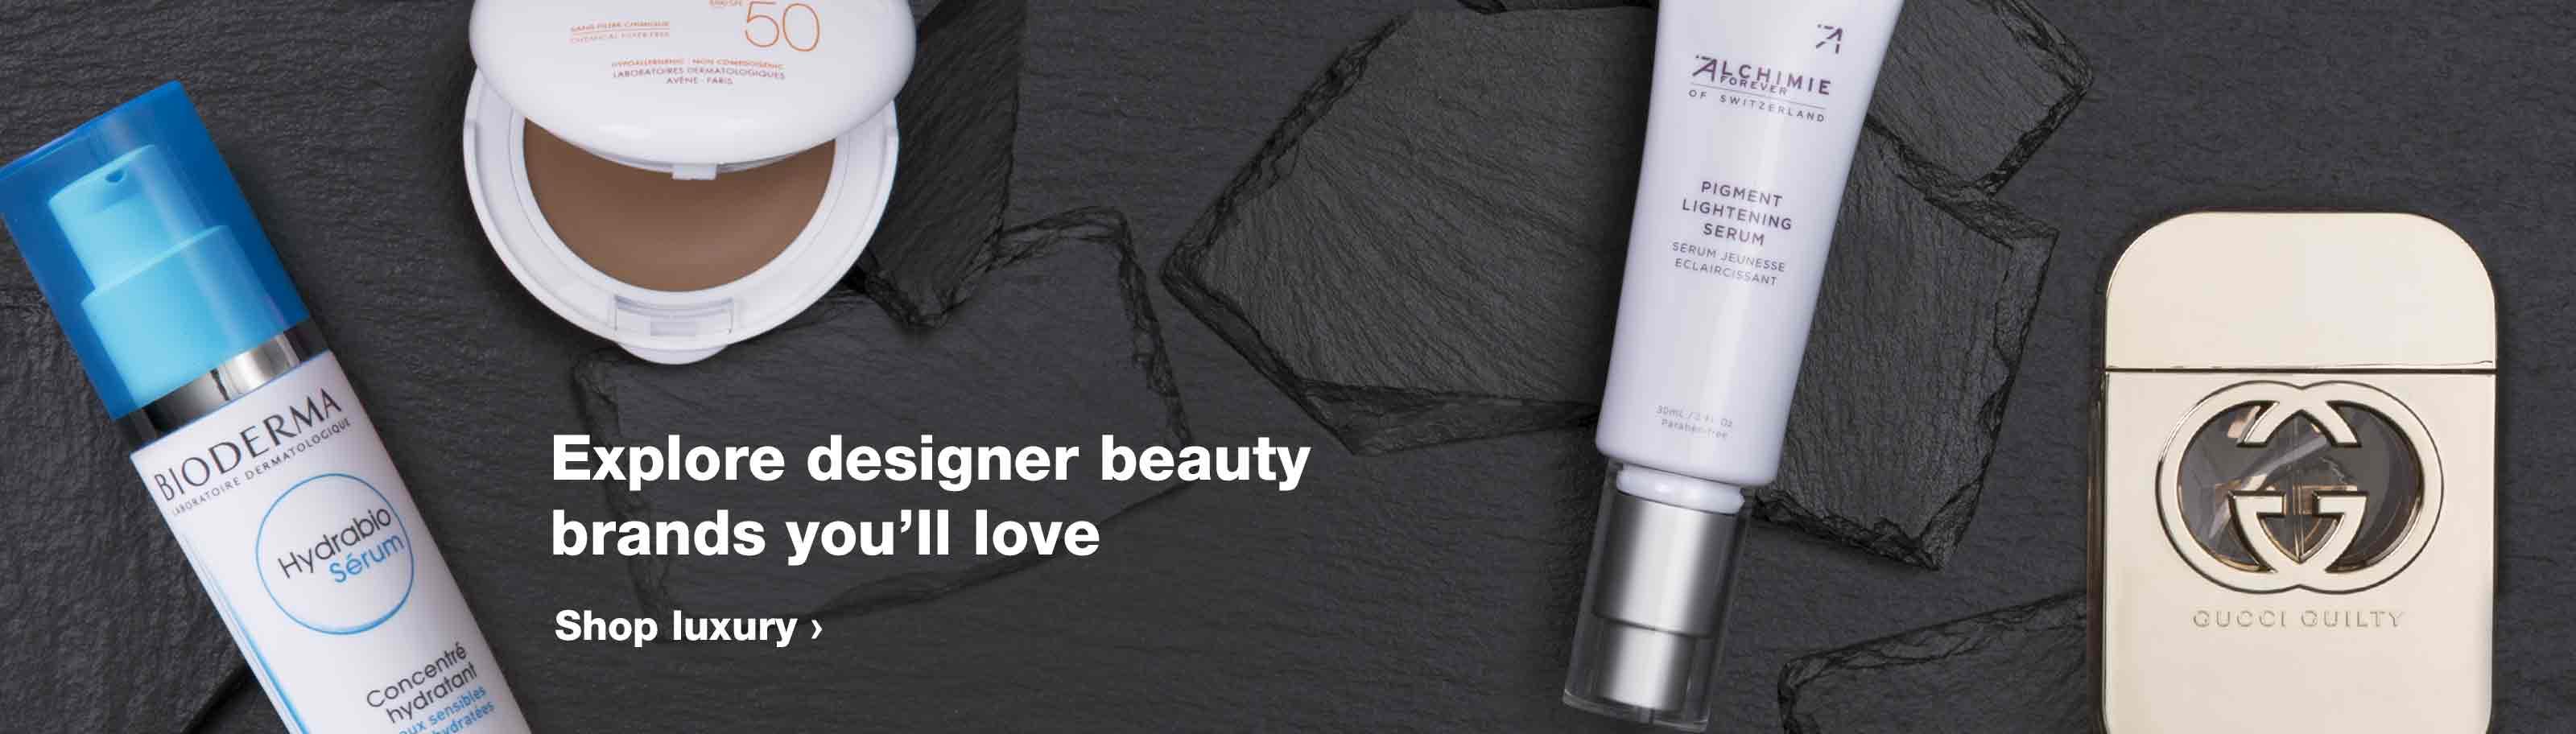 645ea15bb75 Explore designer beauty brands you'll love. Shop luxury.